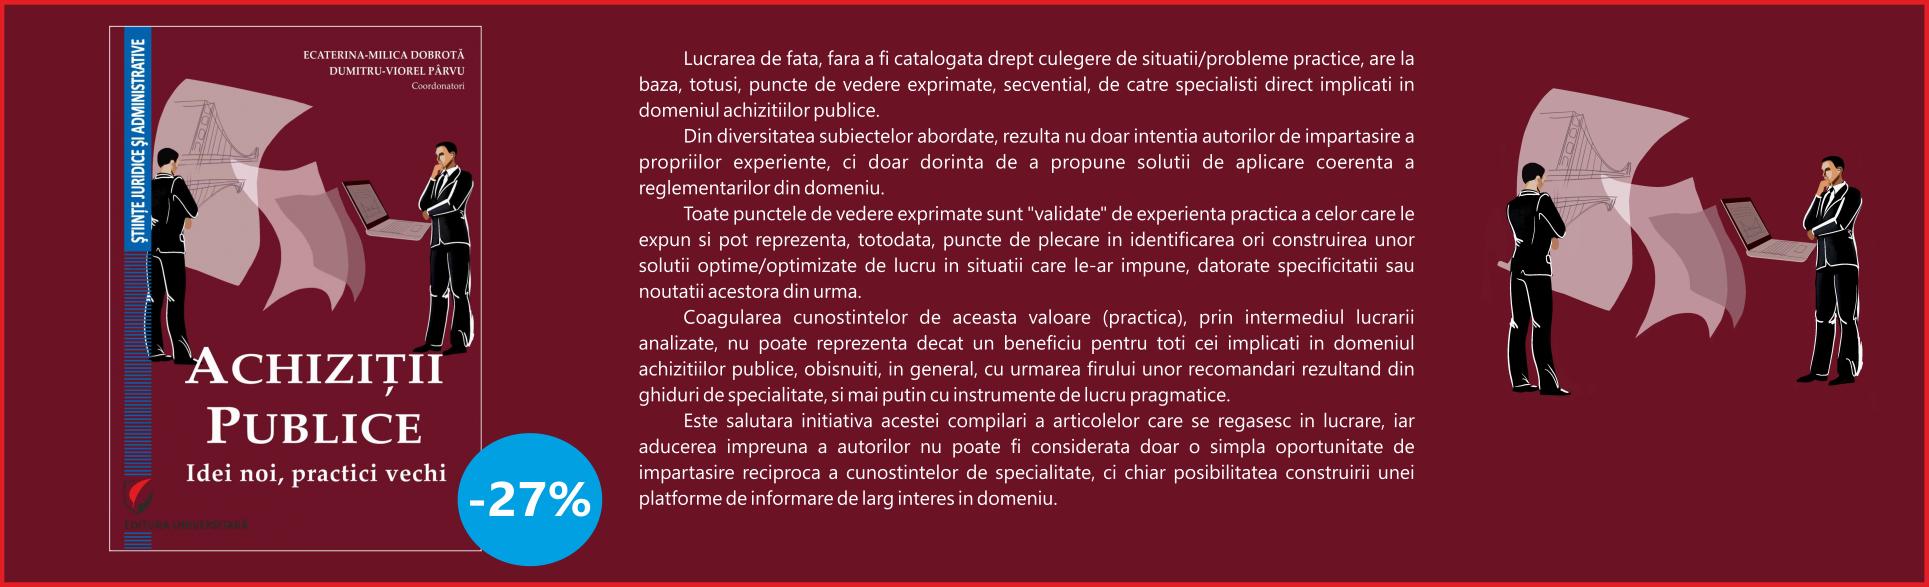 Homepage_3_Achizitii publice ...